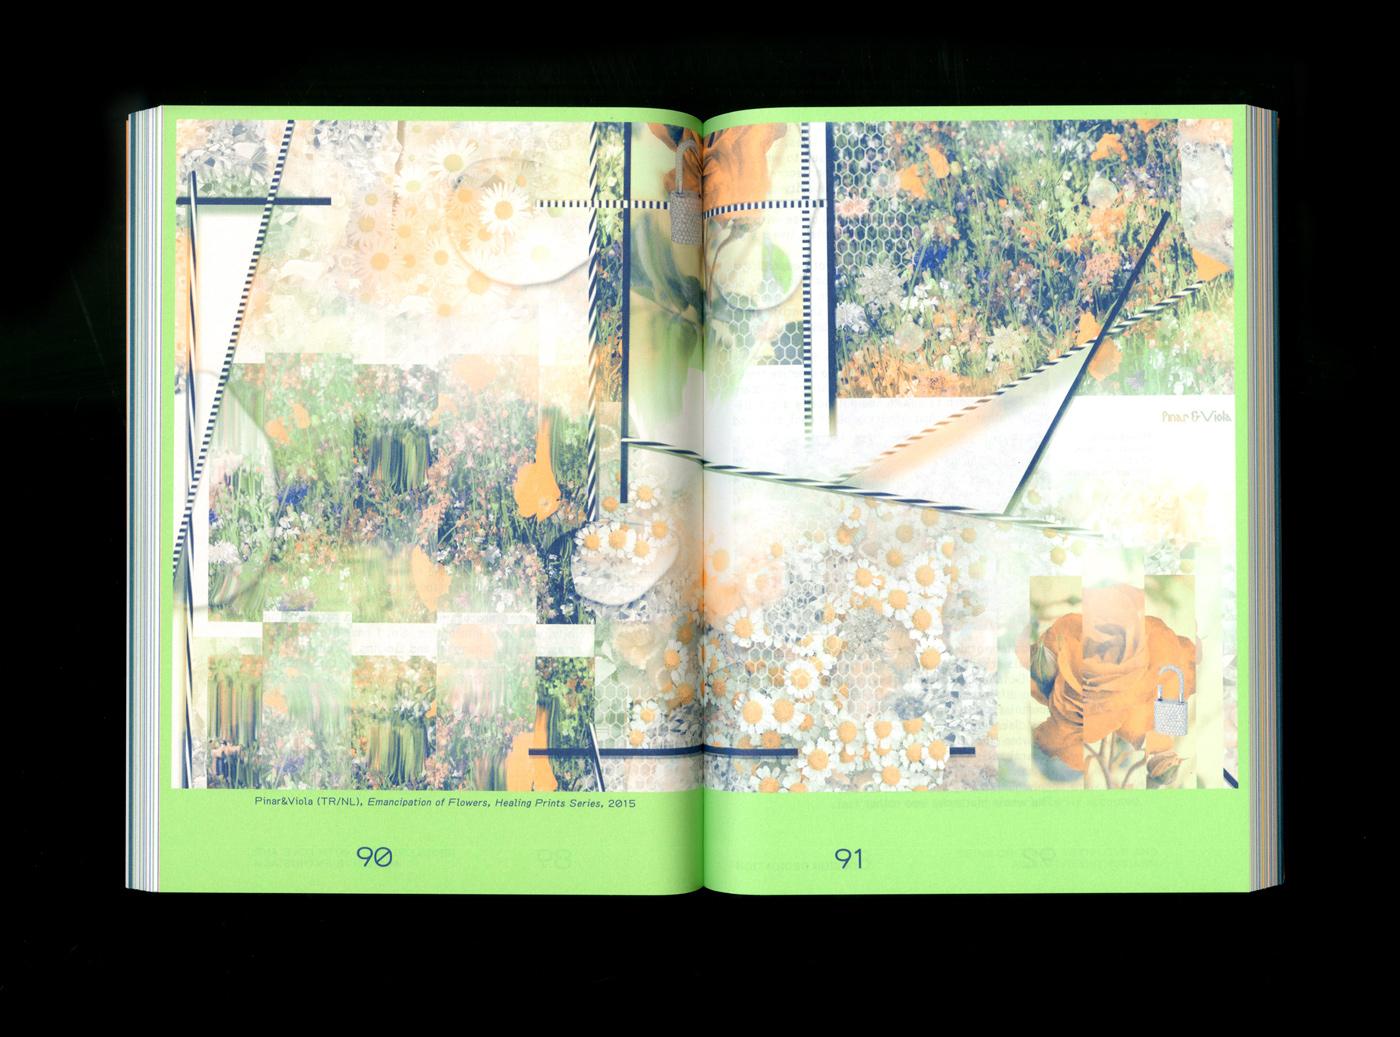 14 collide24 Tessa Meeus Alex Walker Design Dedication - Tessa Meeus and Alex Walker talk us through the creative process behind the book 'Design Dedication', edited by Annelys de Vet and published by Valiz